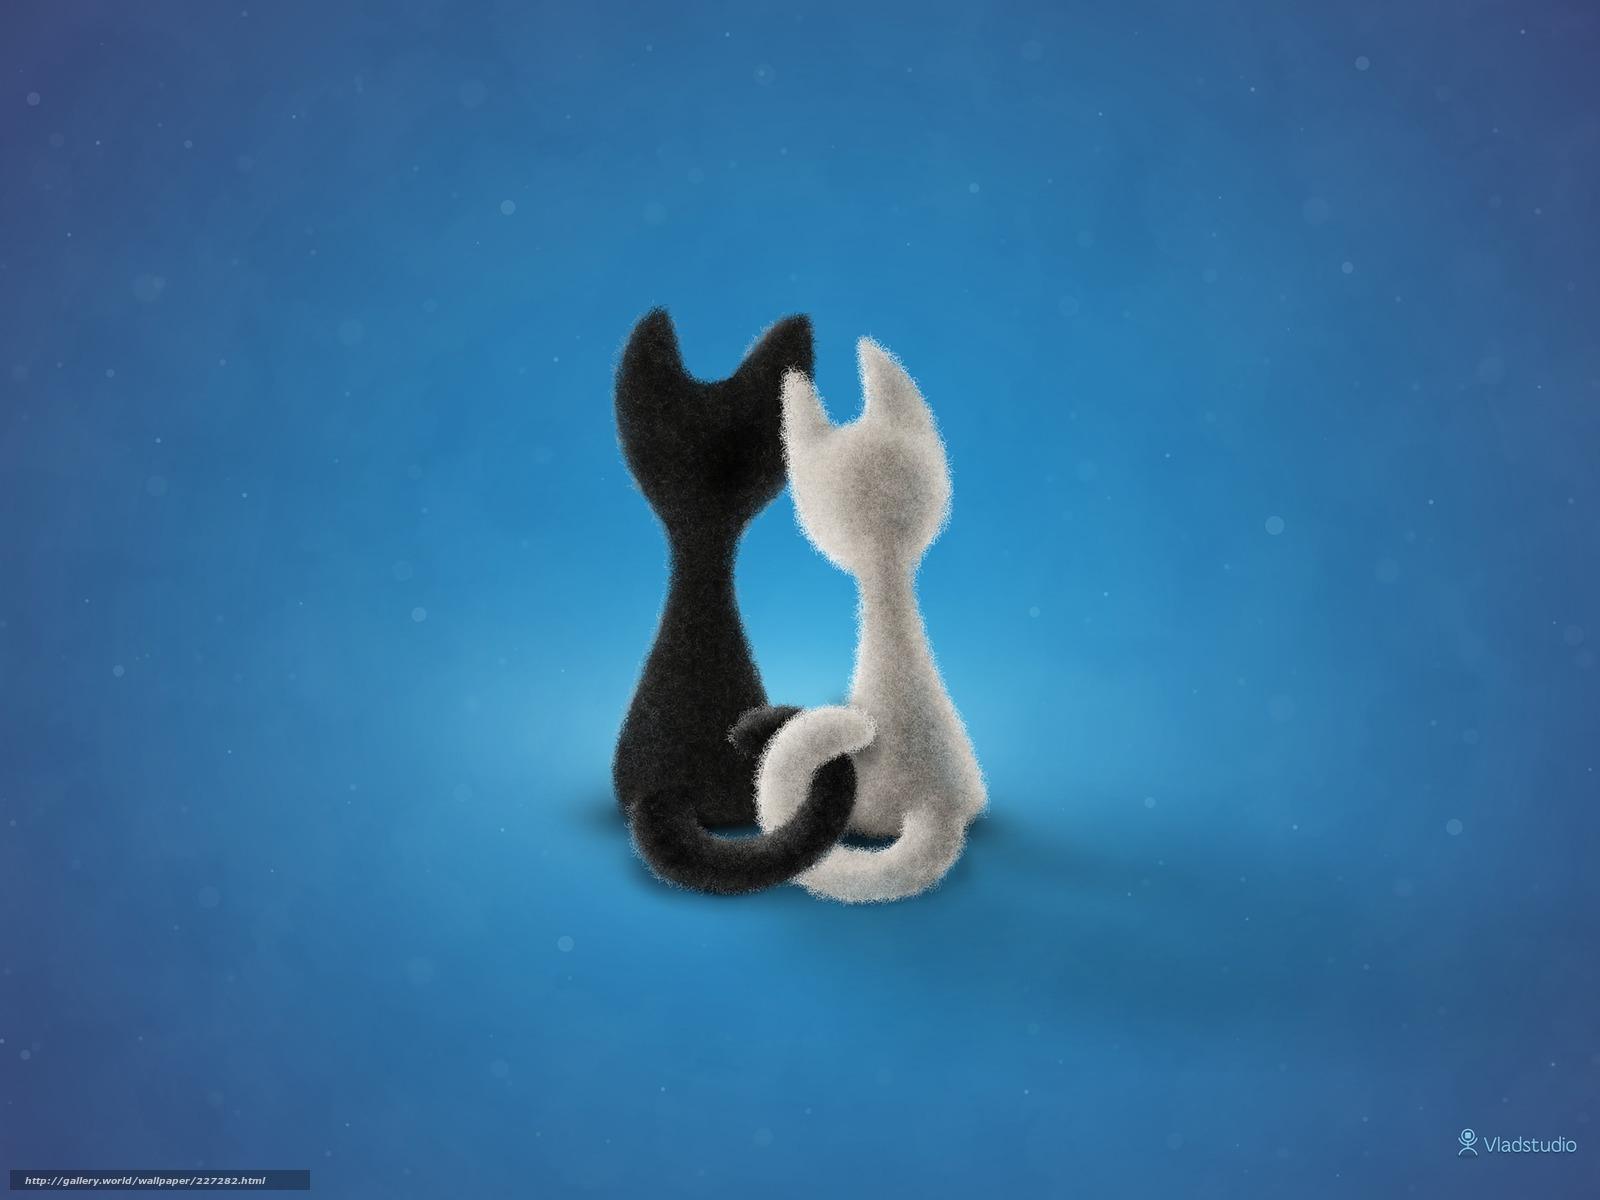 картинки с кошками про любовь: